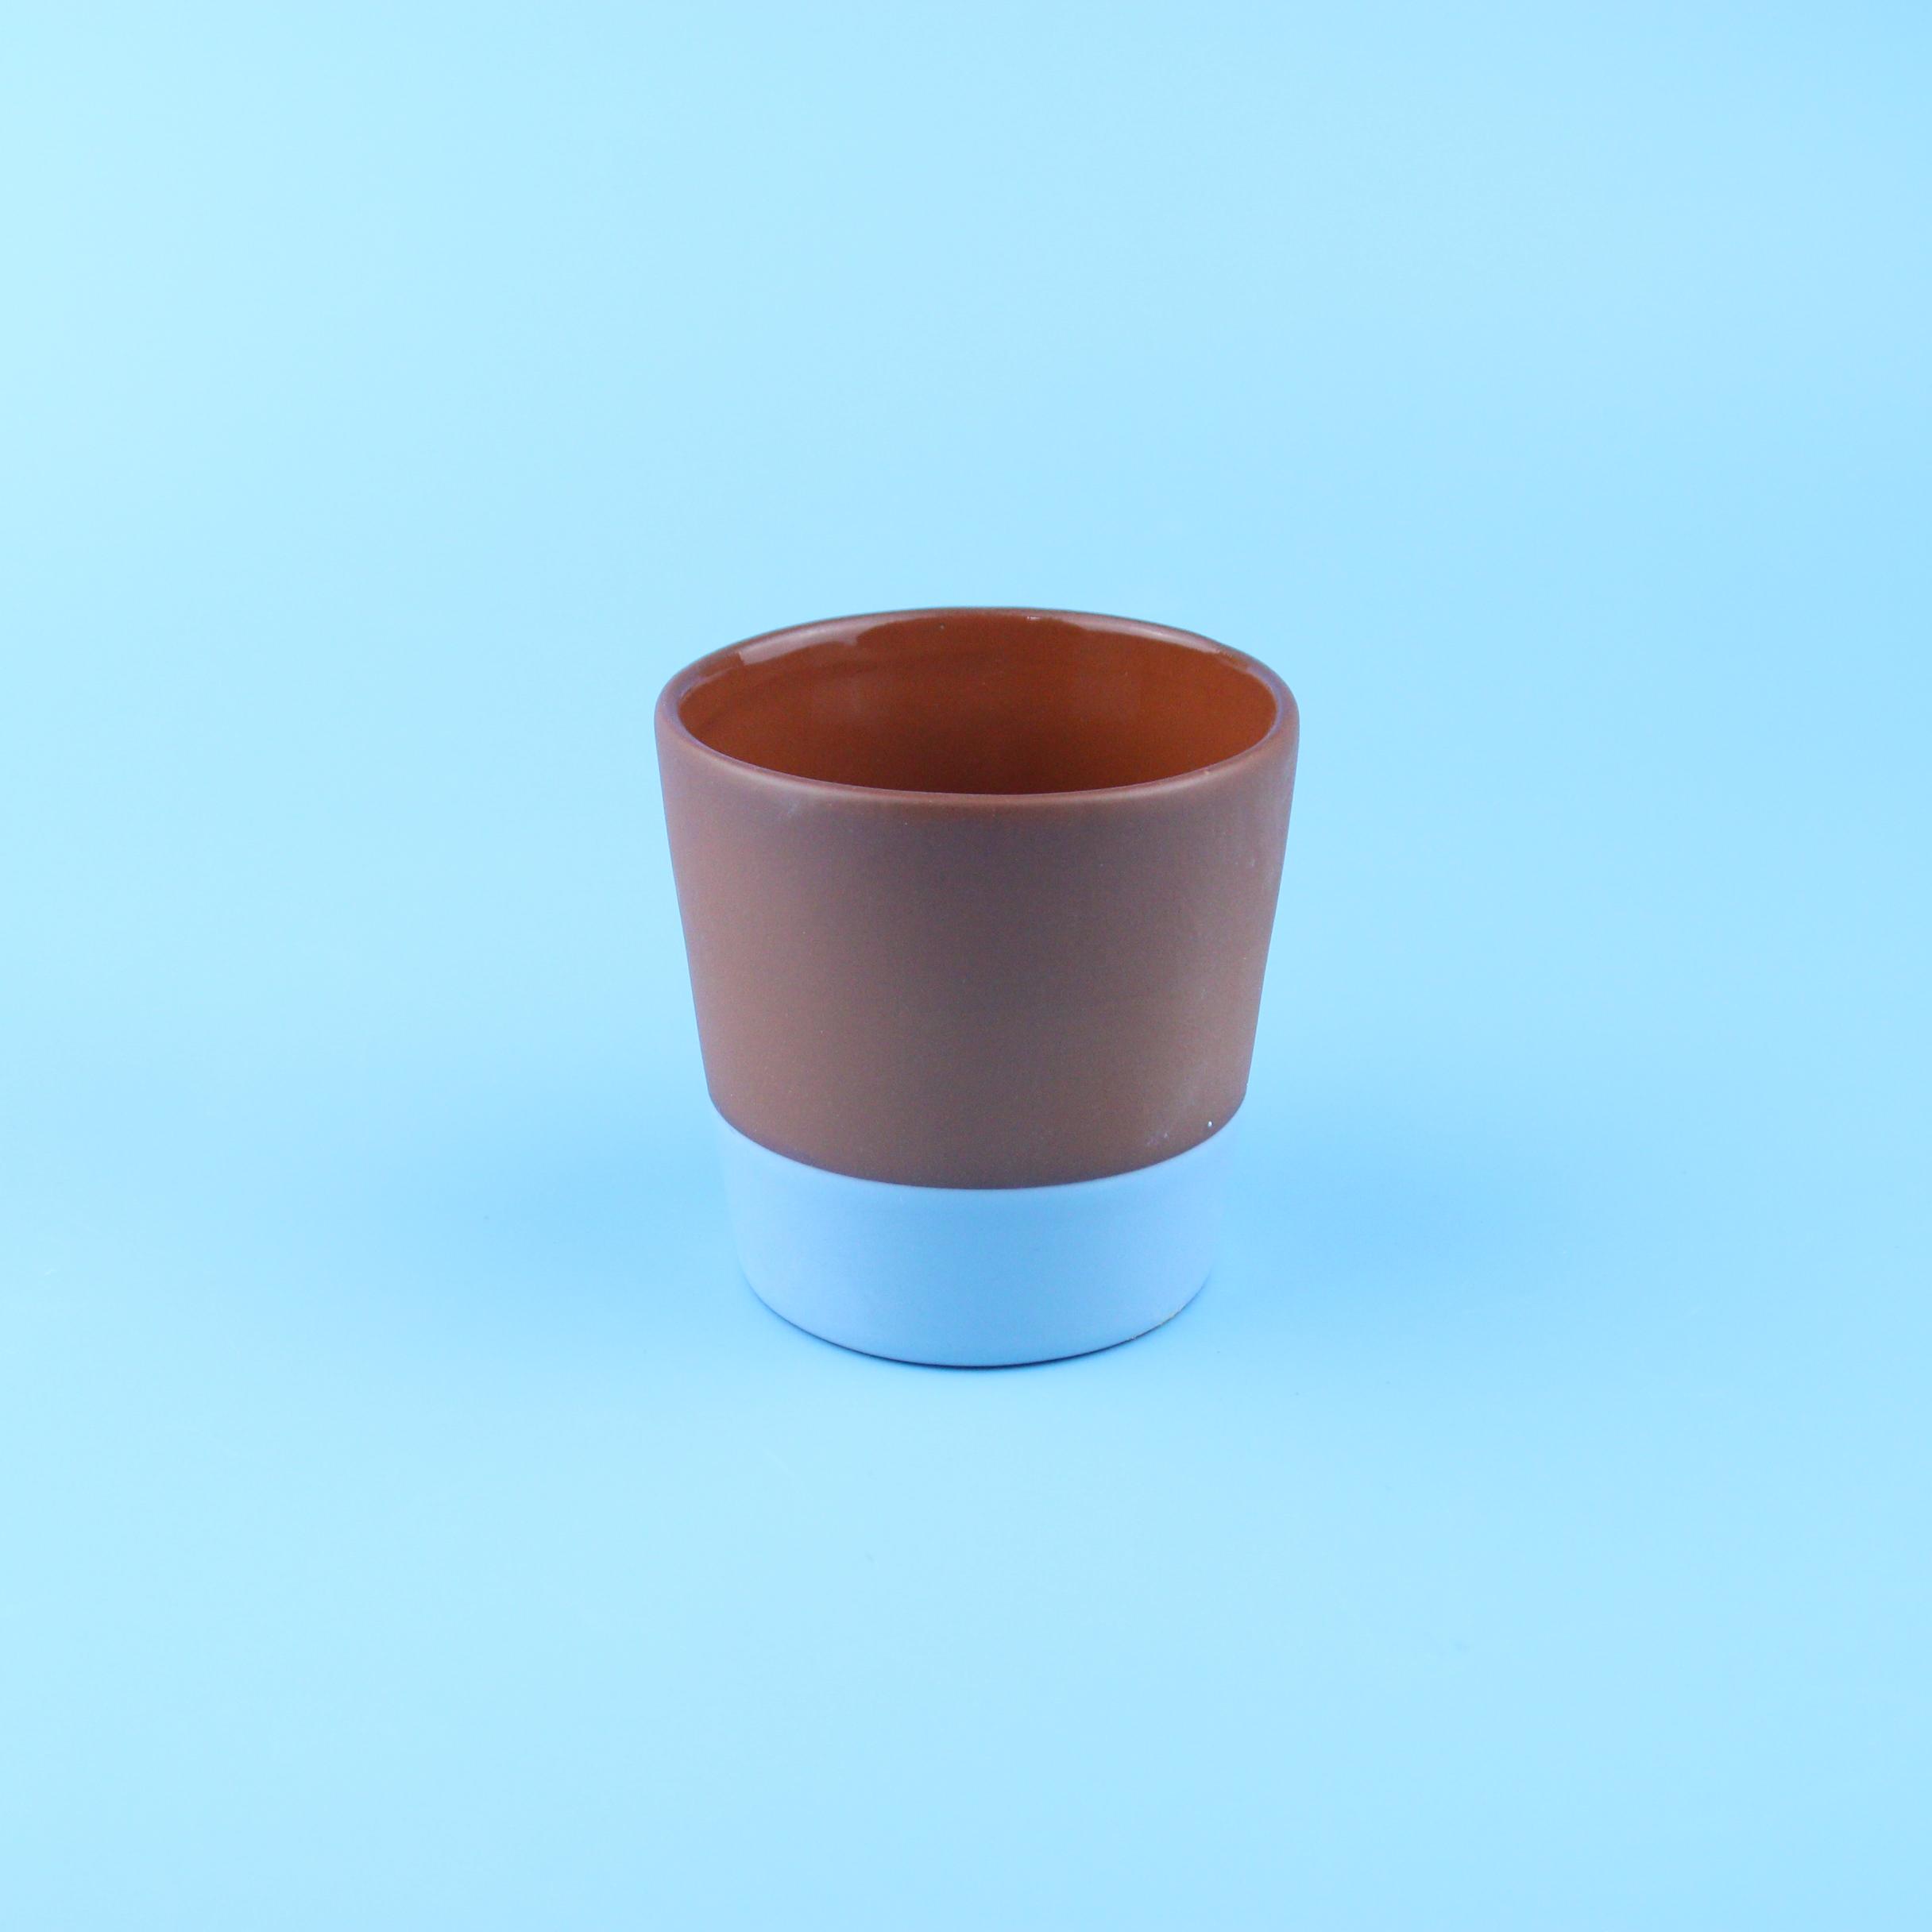 Terrapot Planter Color Clay Buy Large Clay Planter Pots Sale Terracotta Pot Clay Ceramic Pottery Planter Product On Alibaba Com